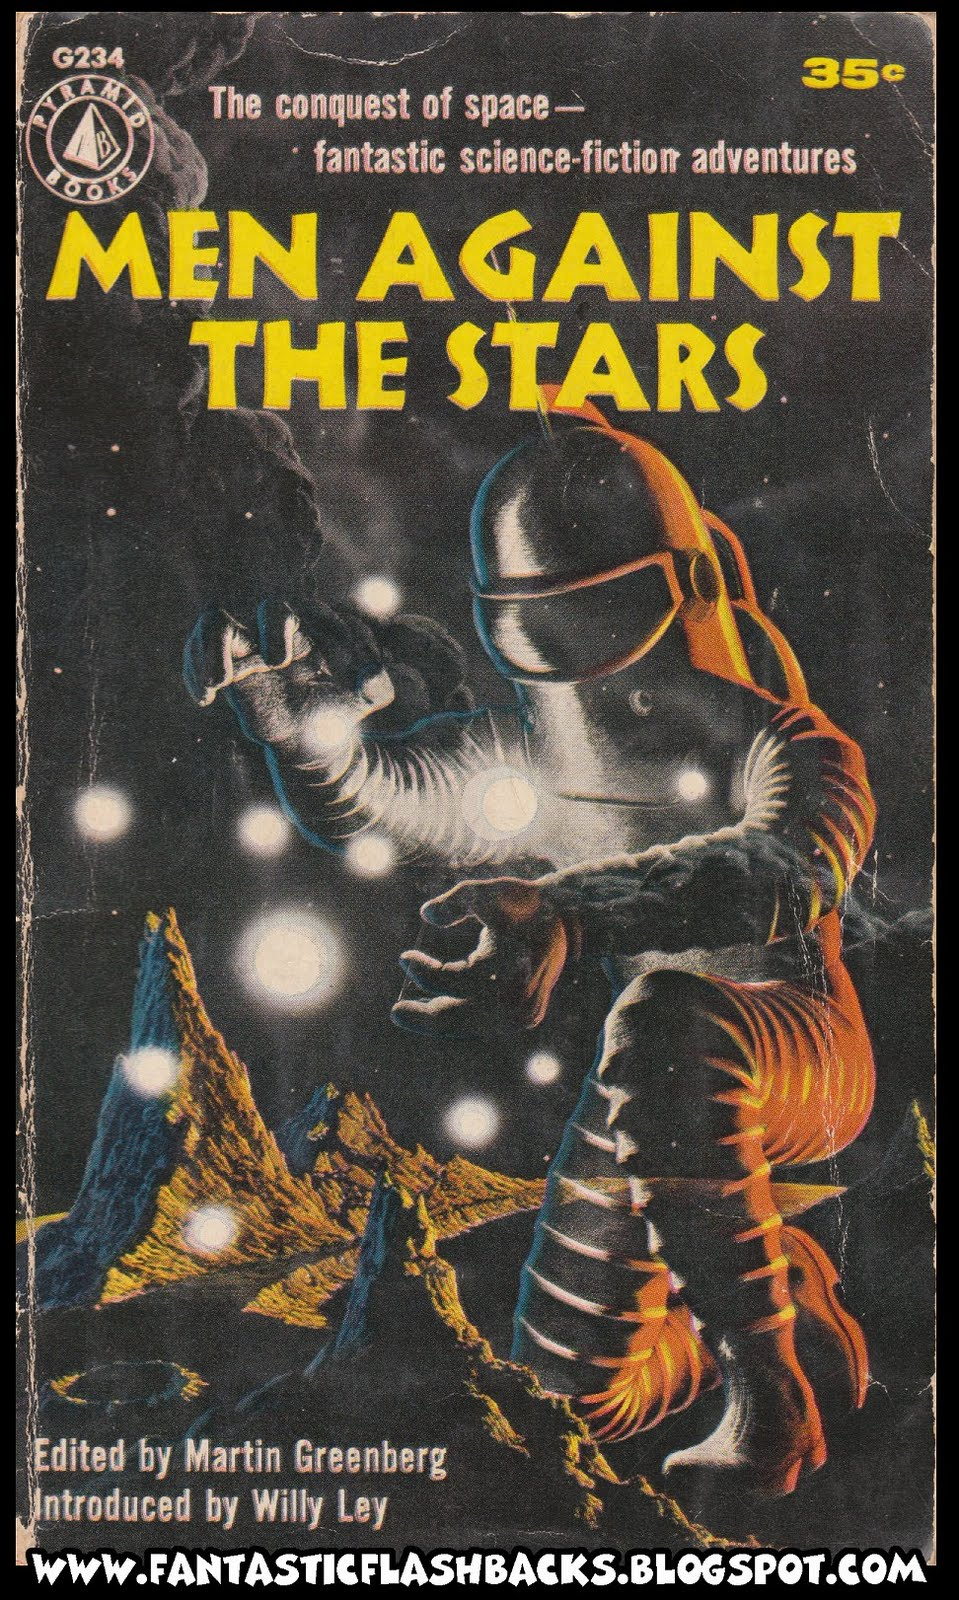 Book recommendations? Preferably Classic/Gothic/Fantasy/Sci-Fi?